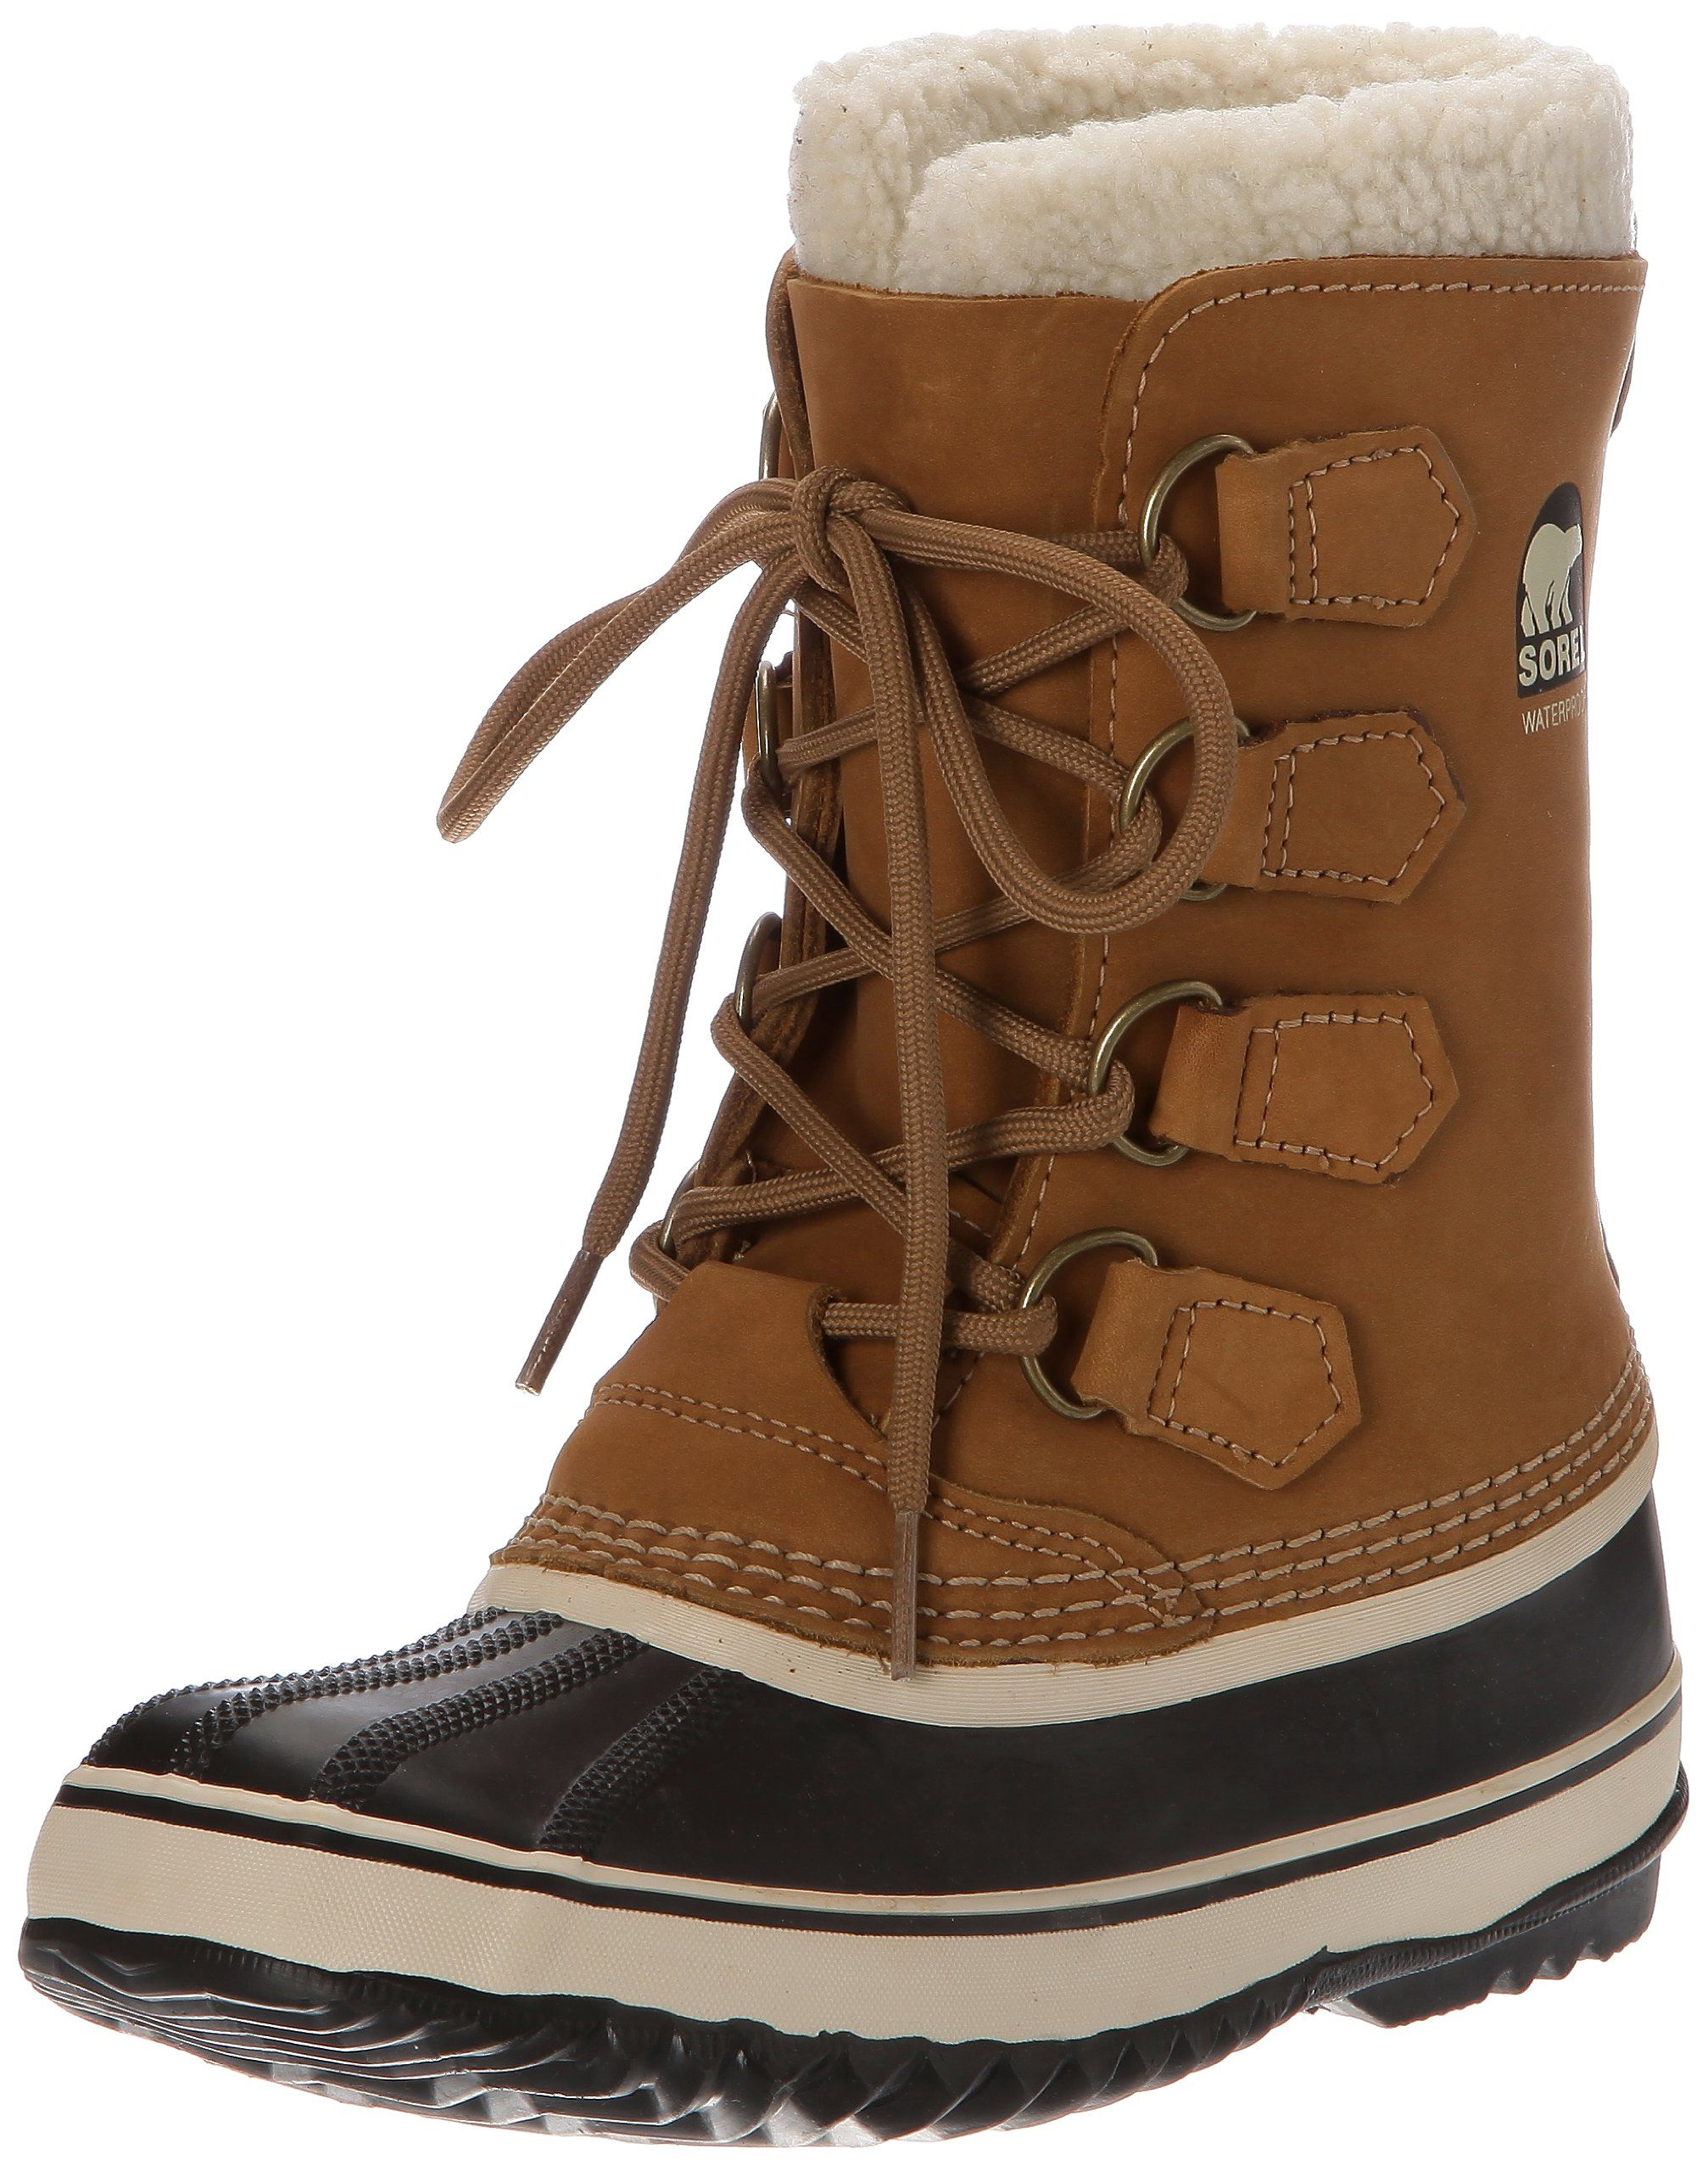 8336fd00b19 Amazon.com: SOREL 1964 Pac 2 Ladies Boot: Clothing | Style ...